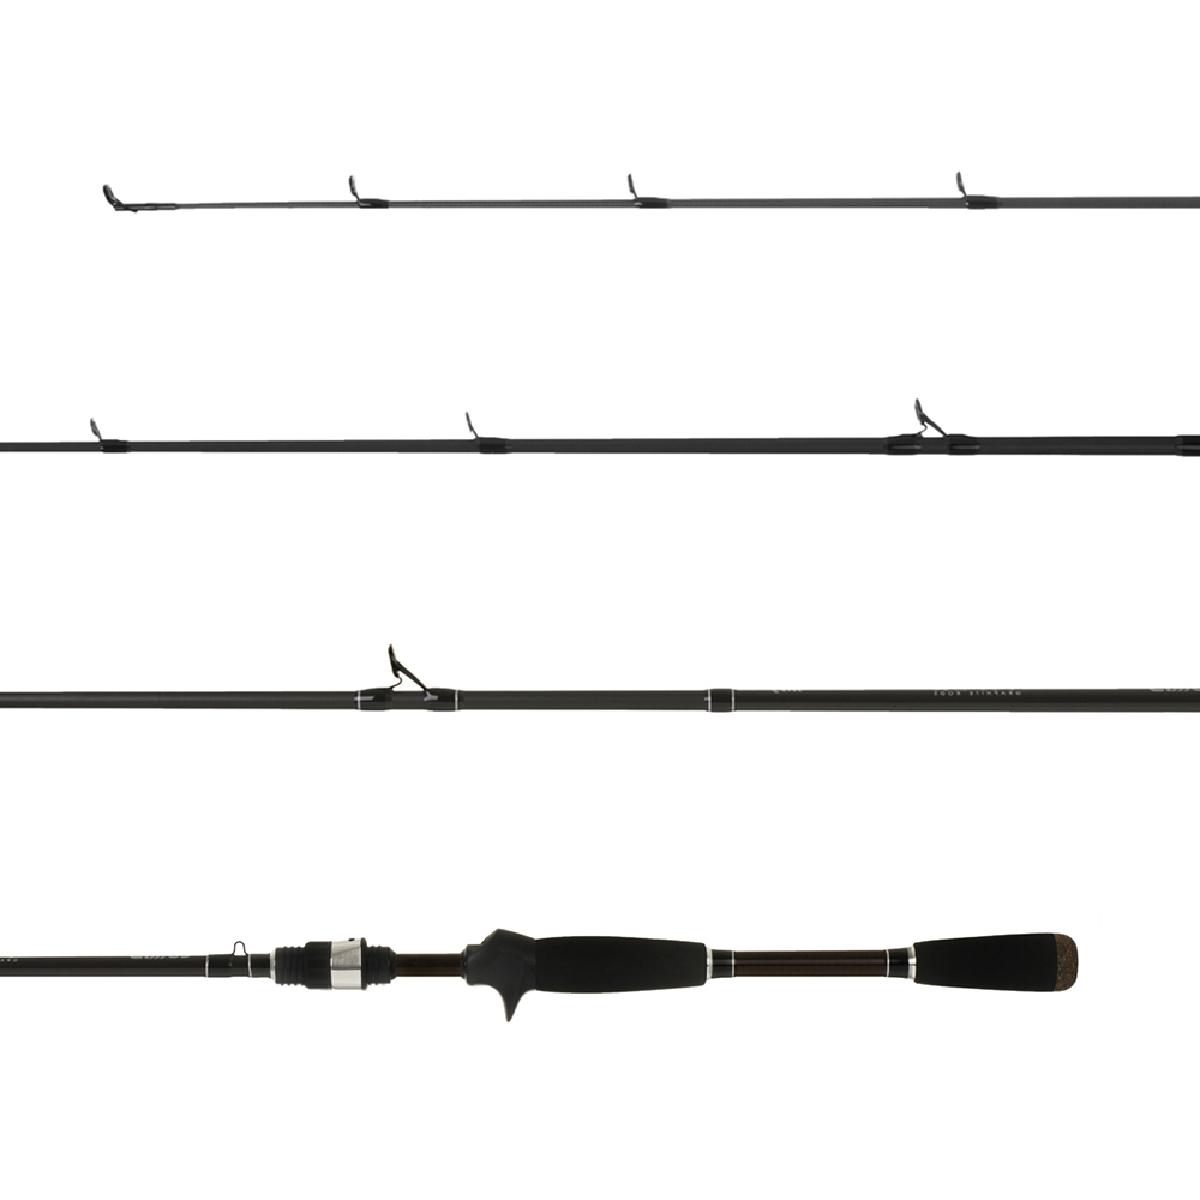 Vara Lumis Viper 562 (1,68m) 5-14lb Carretilha 2 Partes  - Pesca Adventure